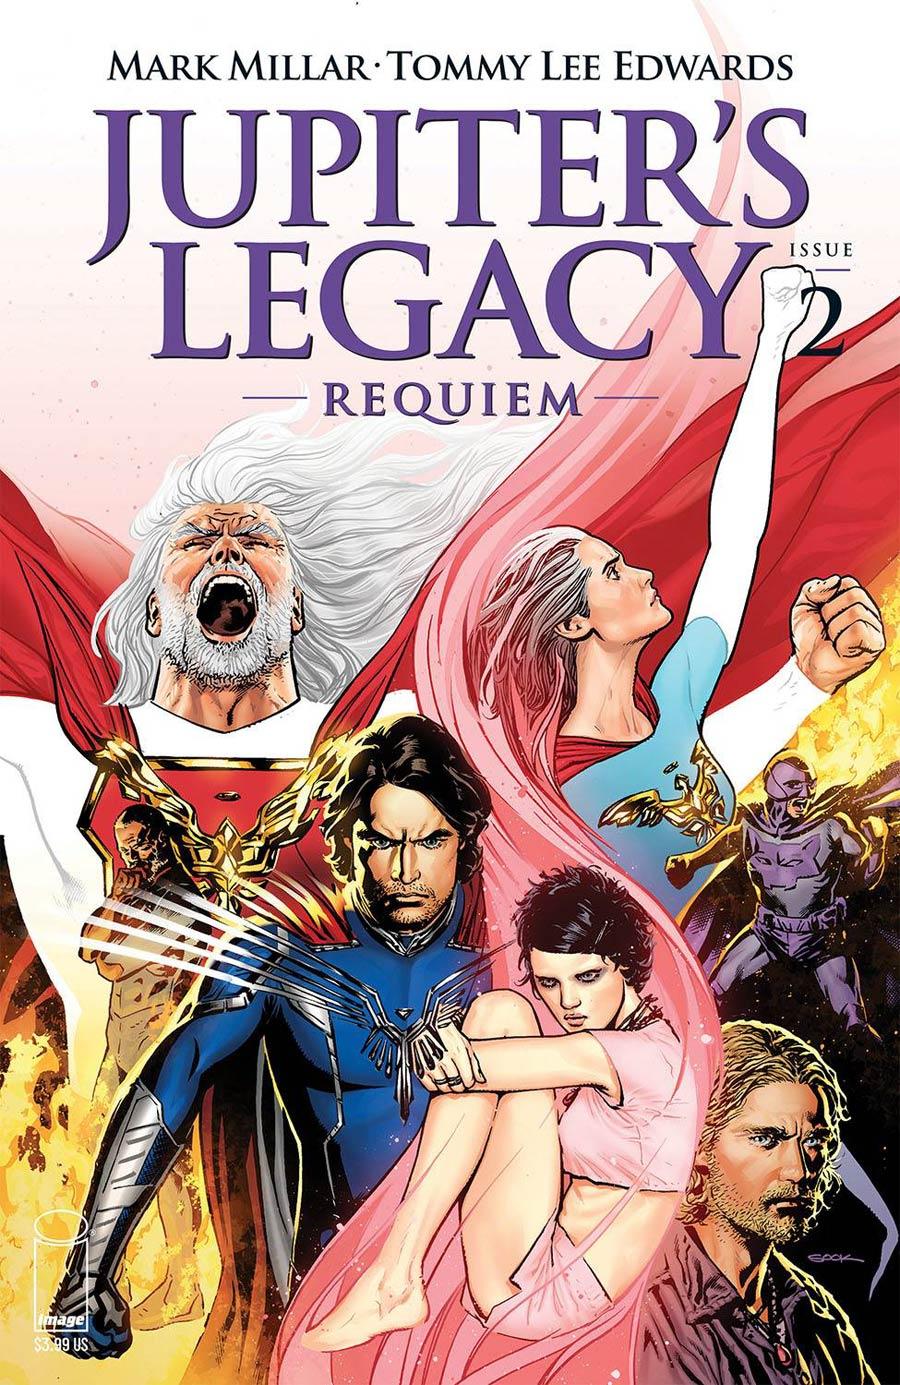 Jupiters Legacy Requiem #2 Cover B Variant Ryan Sook Color Cover